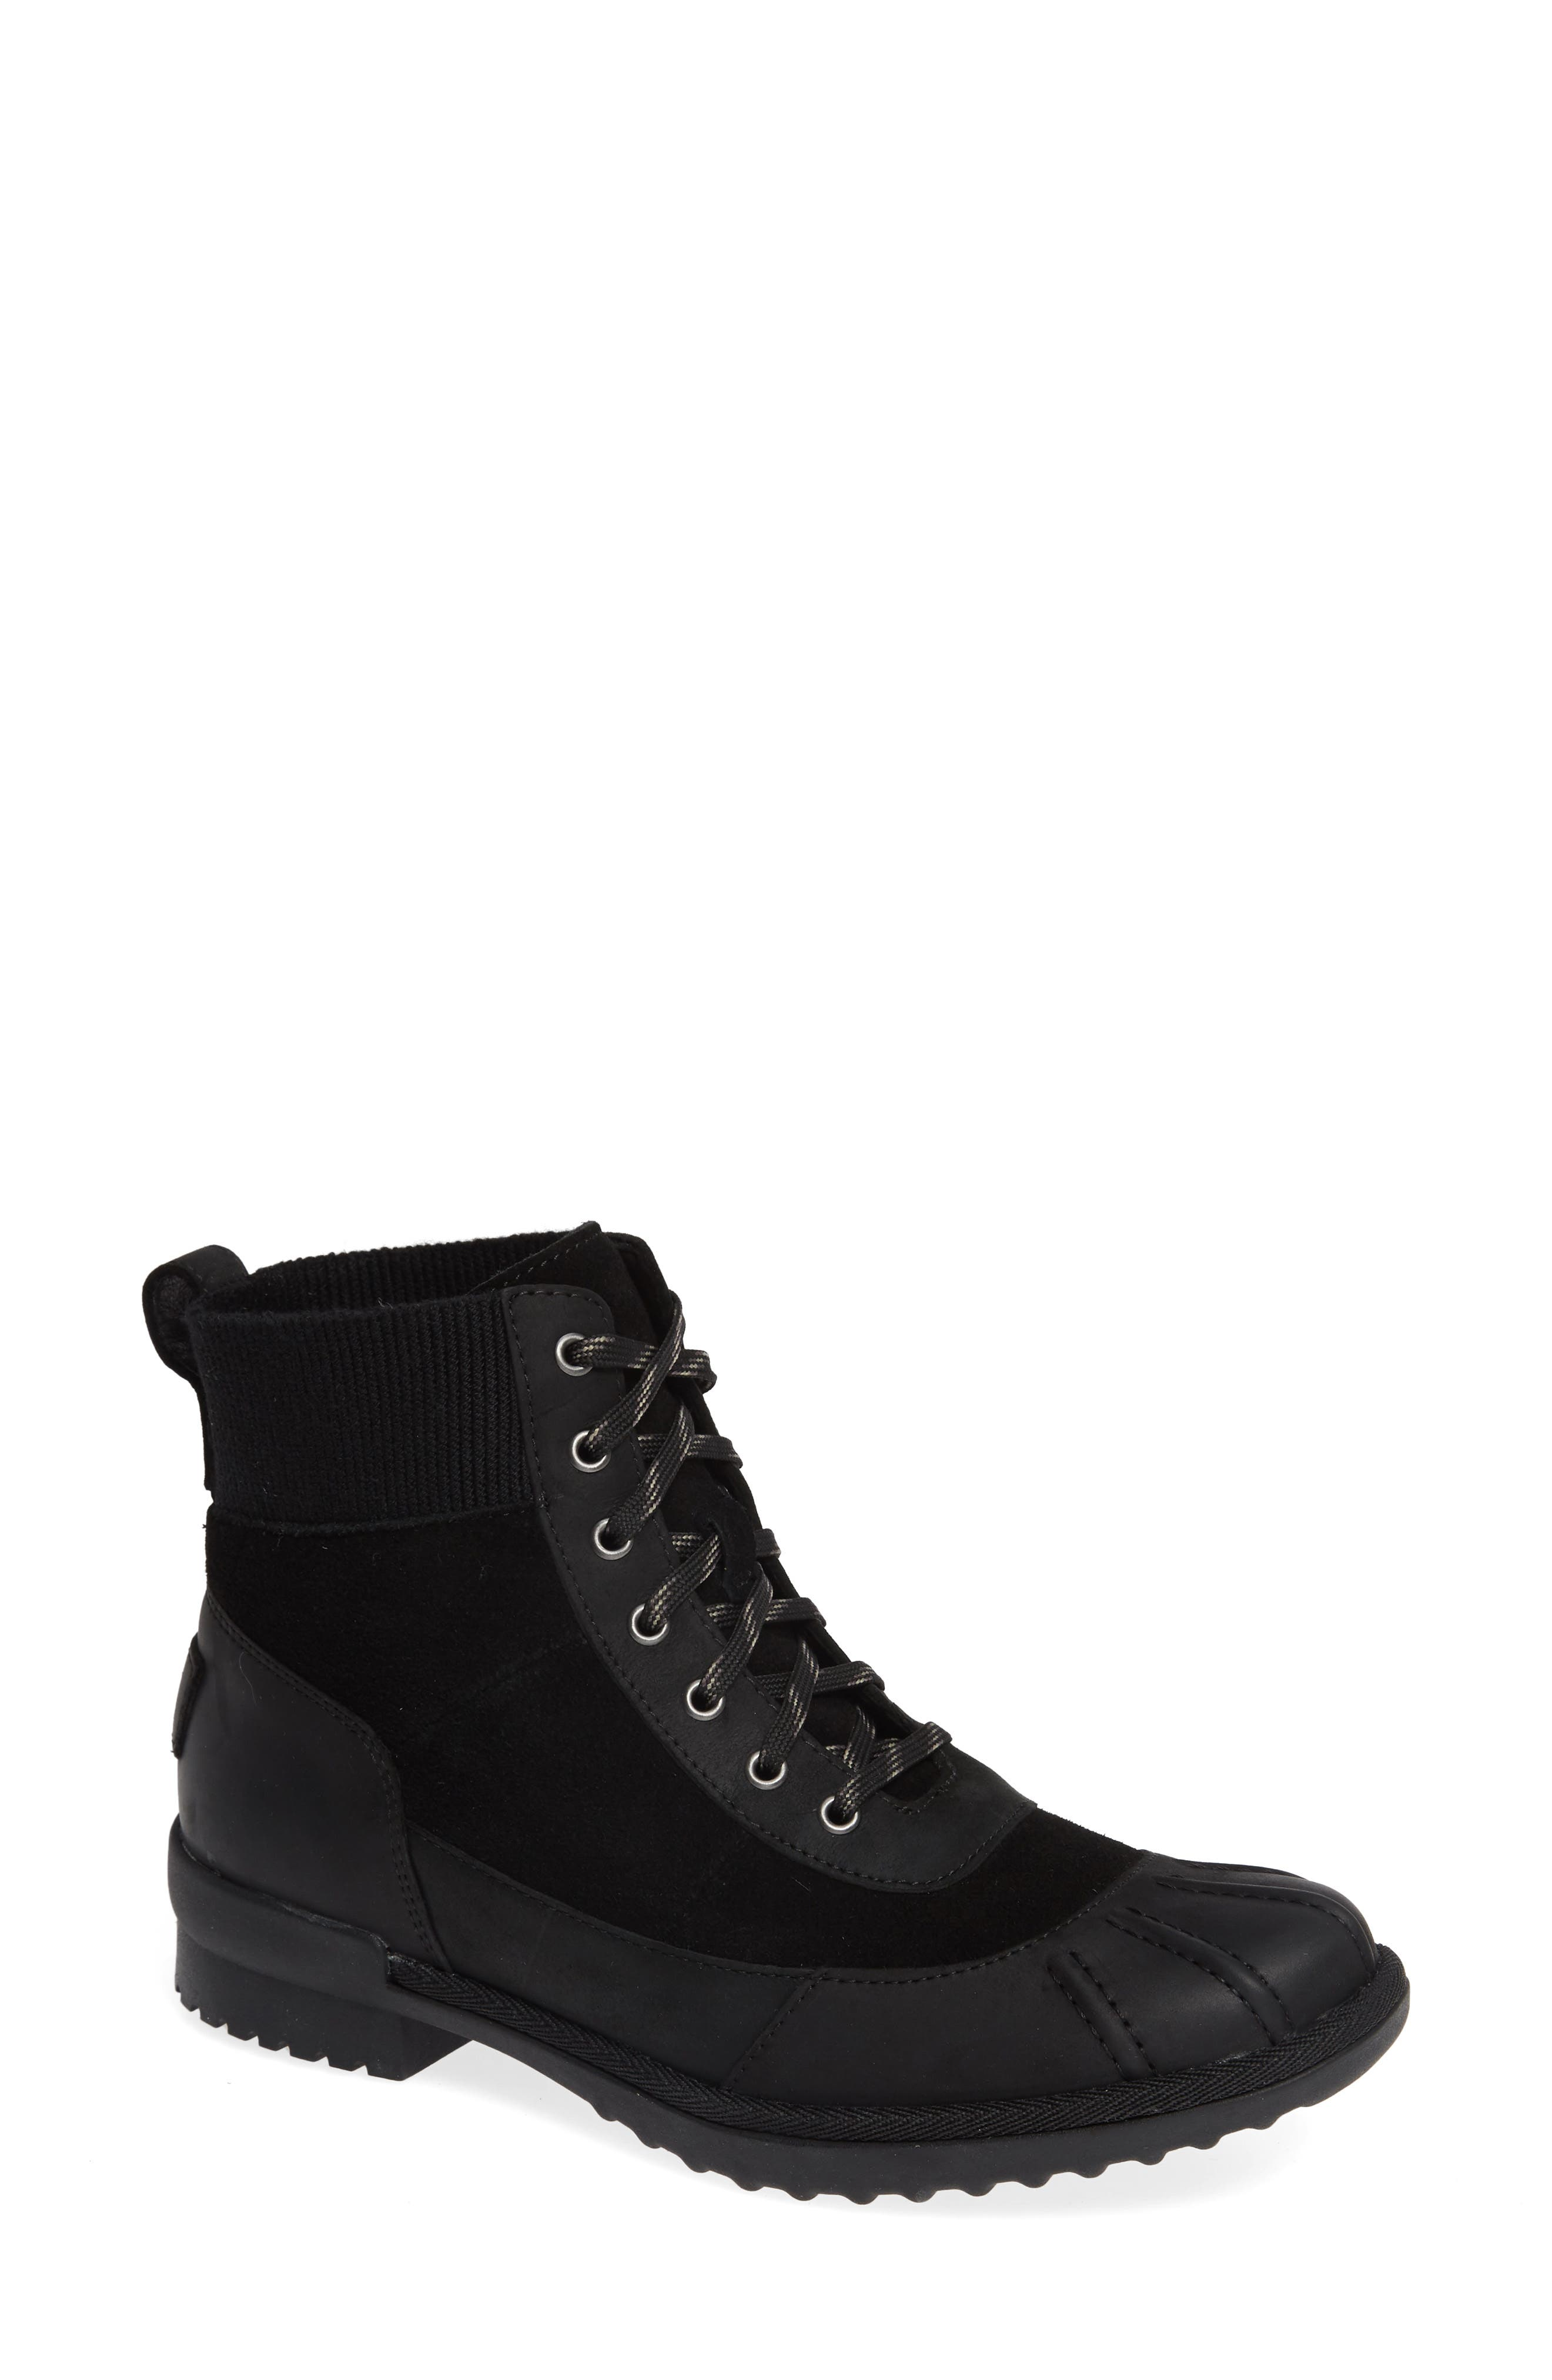 Ugg Cayli Waterproof Duck Boot- Black